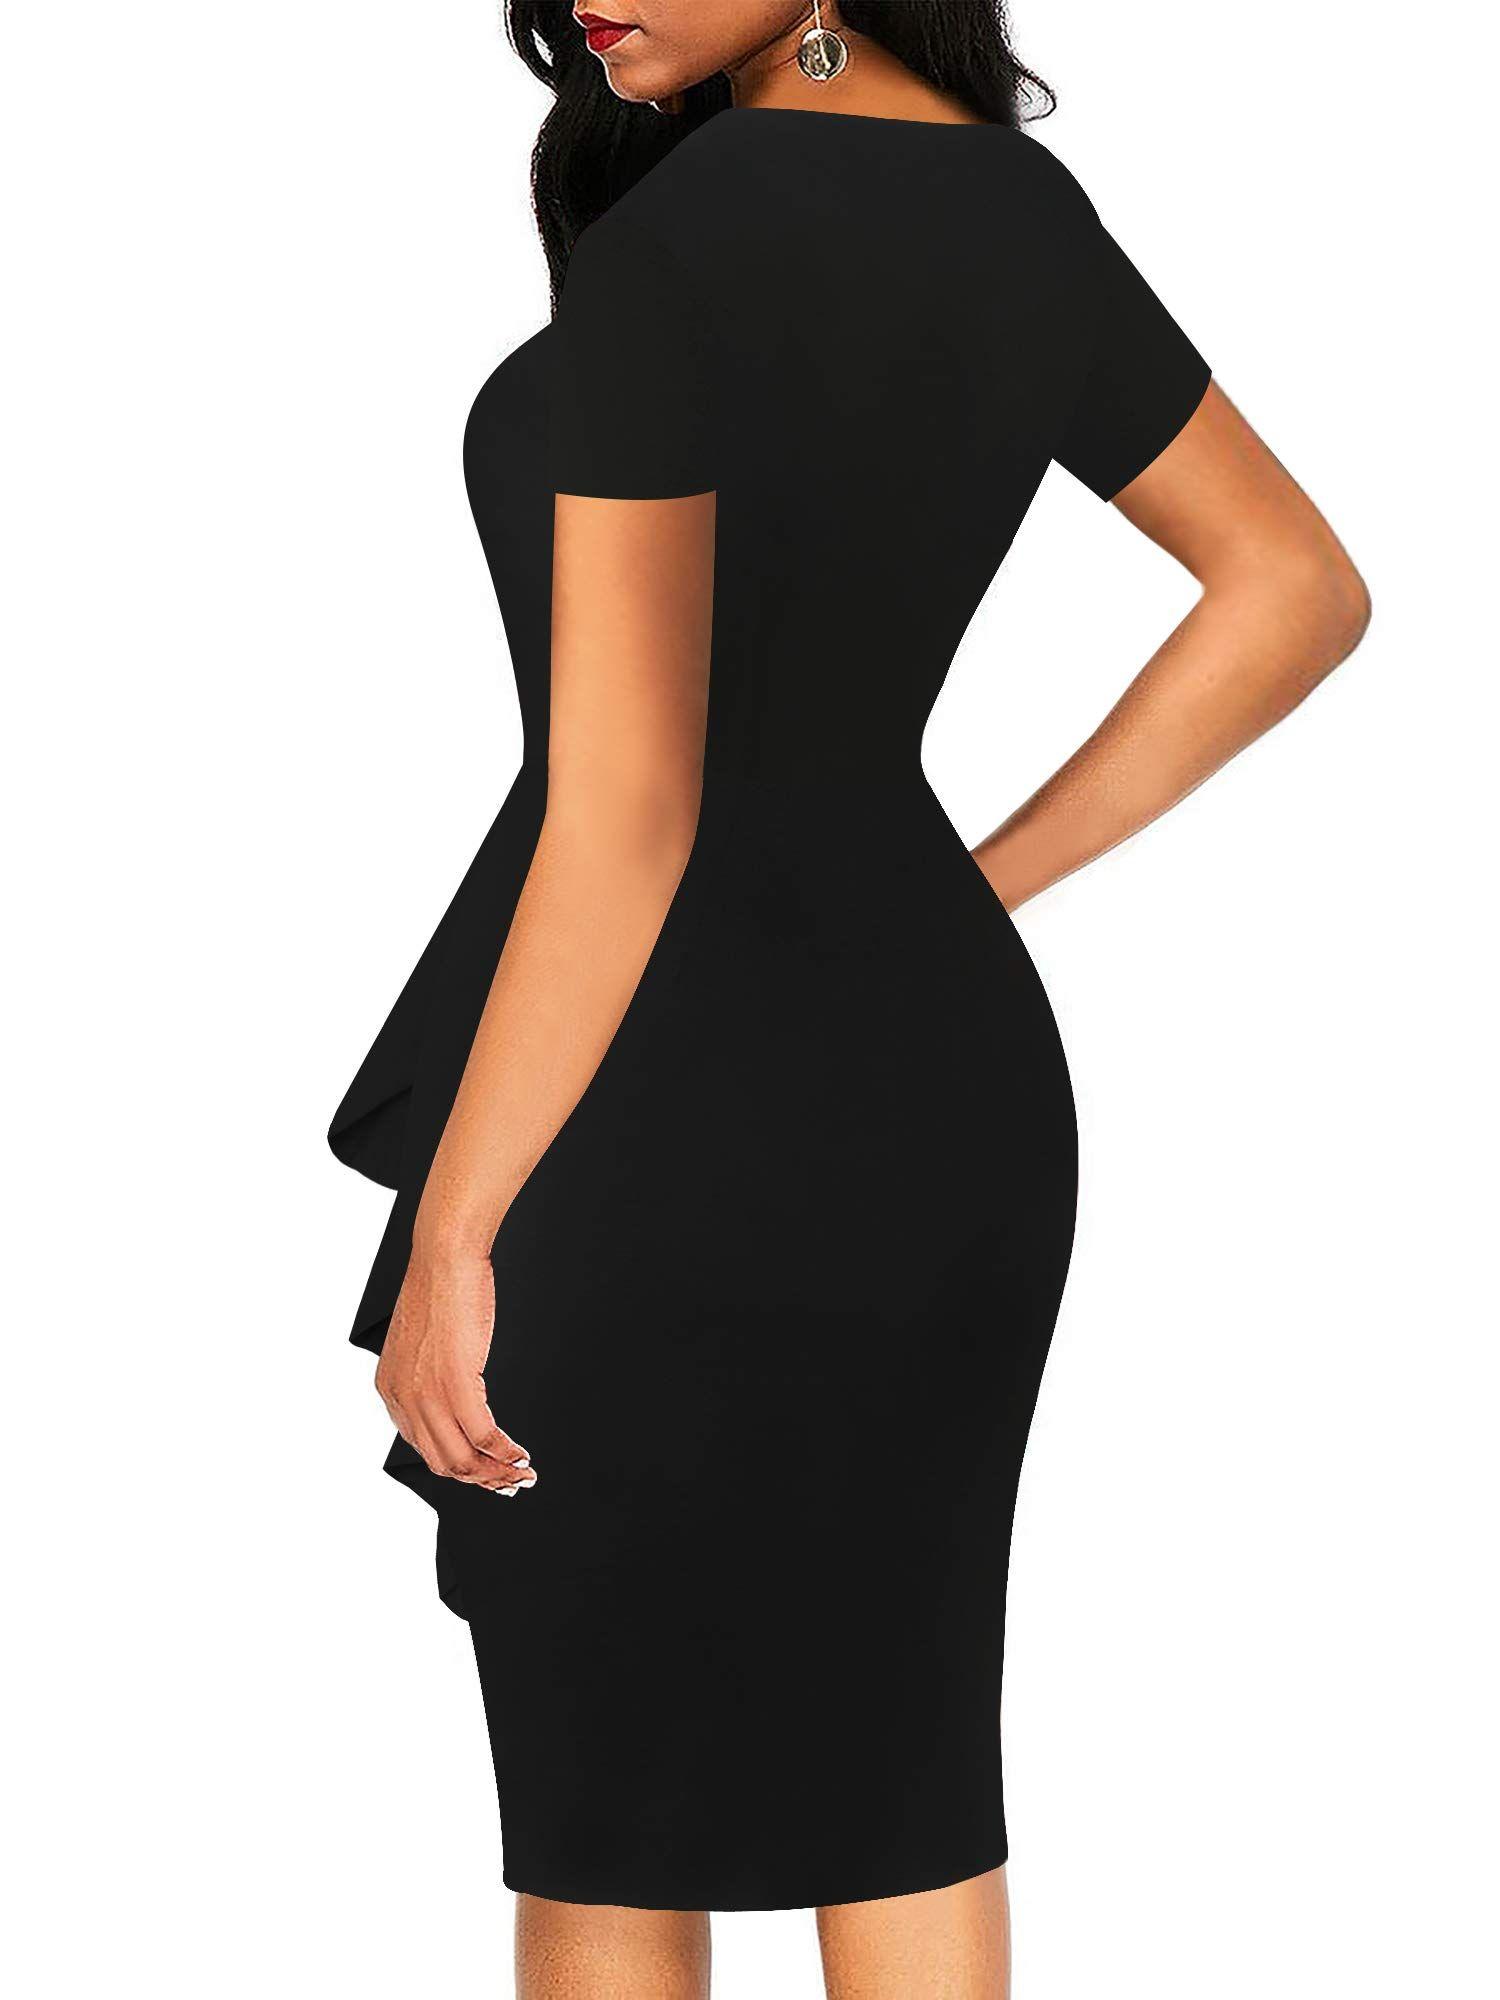 Sakaly Womens Vintage Sleeve Pencil Work Dresses For Women Midi Pencil Dress Dresses [ 2000 x 1500 Pixel ]